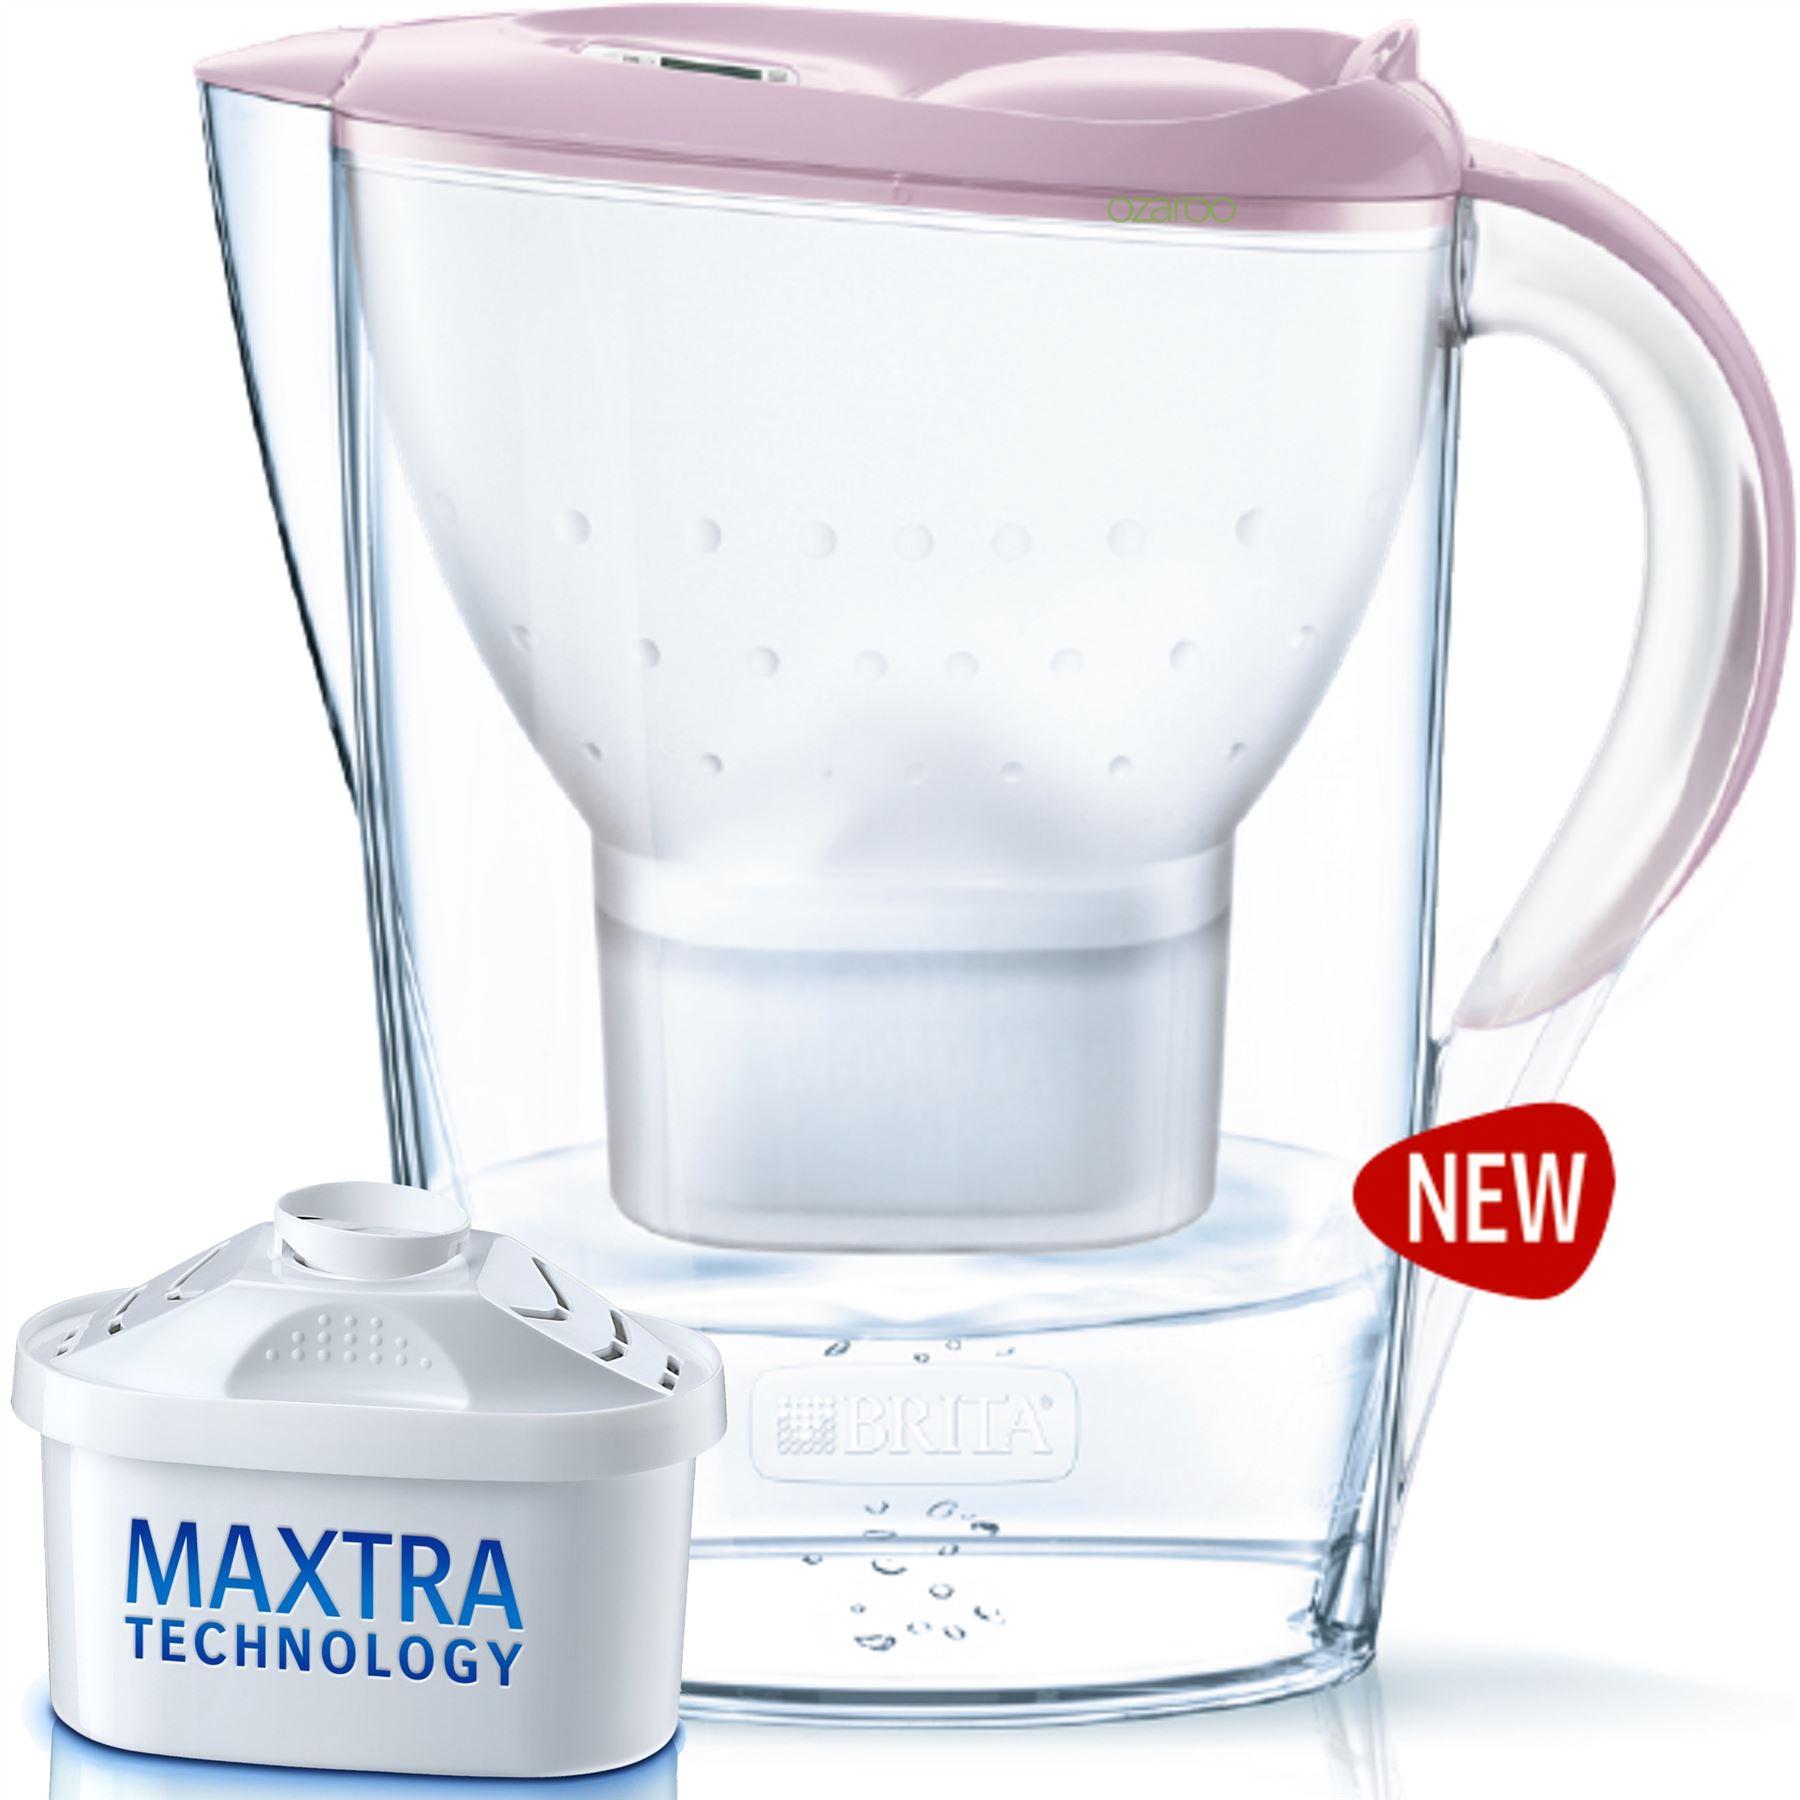 brita marella home fridge water filter jug pastel gentle rose maxtra cartridge ebay. Black Bedroom Furniture Sets. Home Design Ideas